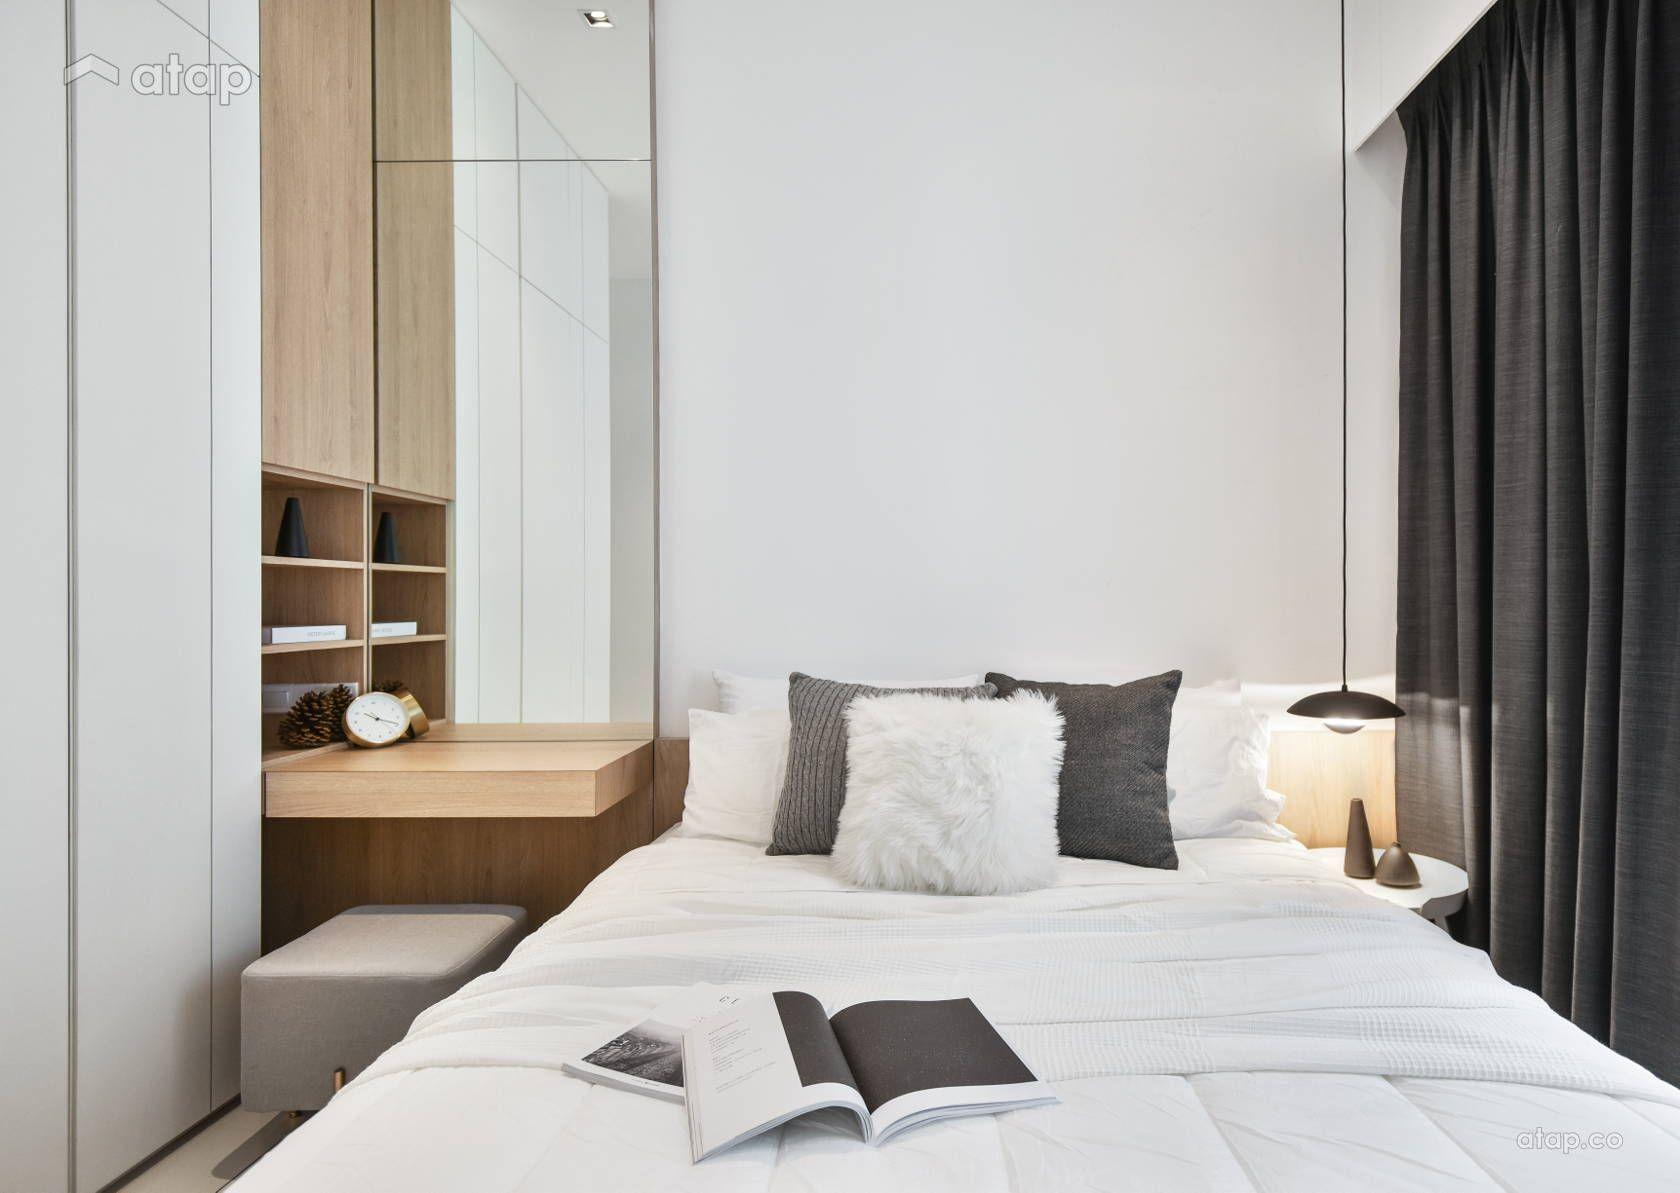 Contemporary minimalistic bedroom terrace design ideas  photos malaysia atap minimalistdecortips also rh pinterest